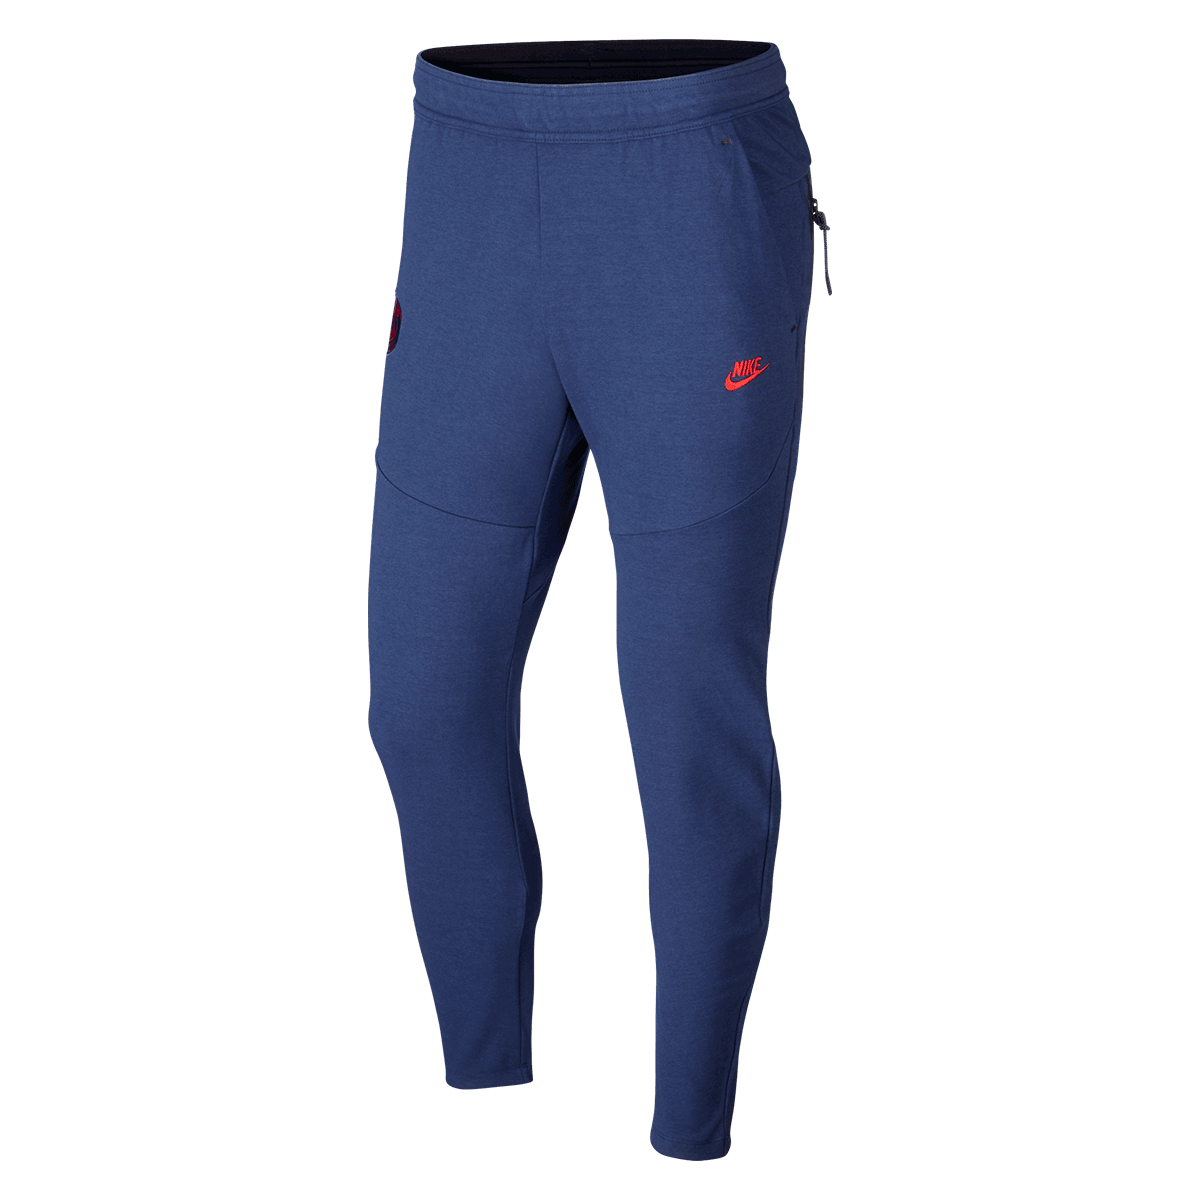 Nike Paris St. Germain Jogginghose Tech Pack Track CL Pant dunkelblaurot